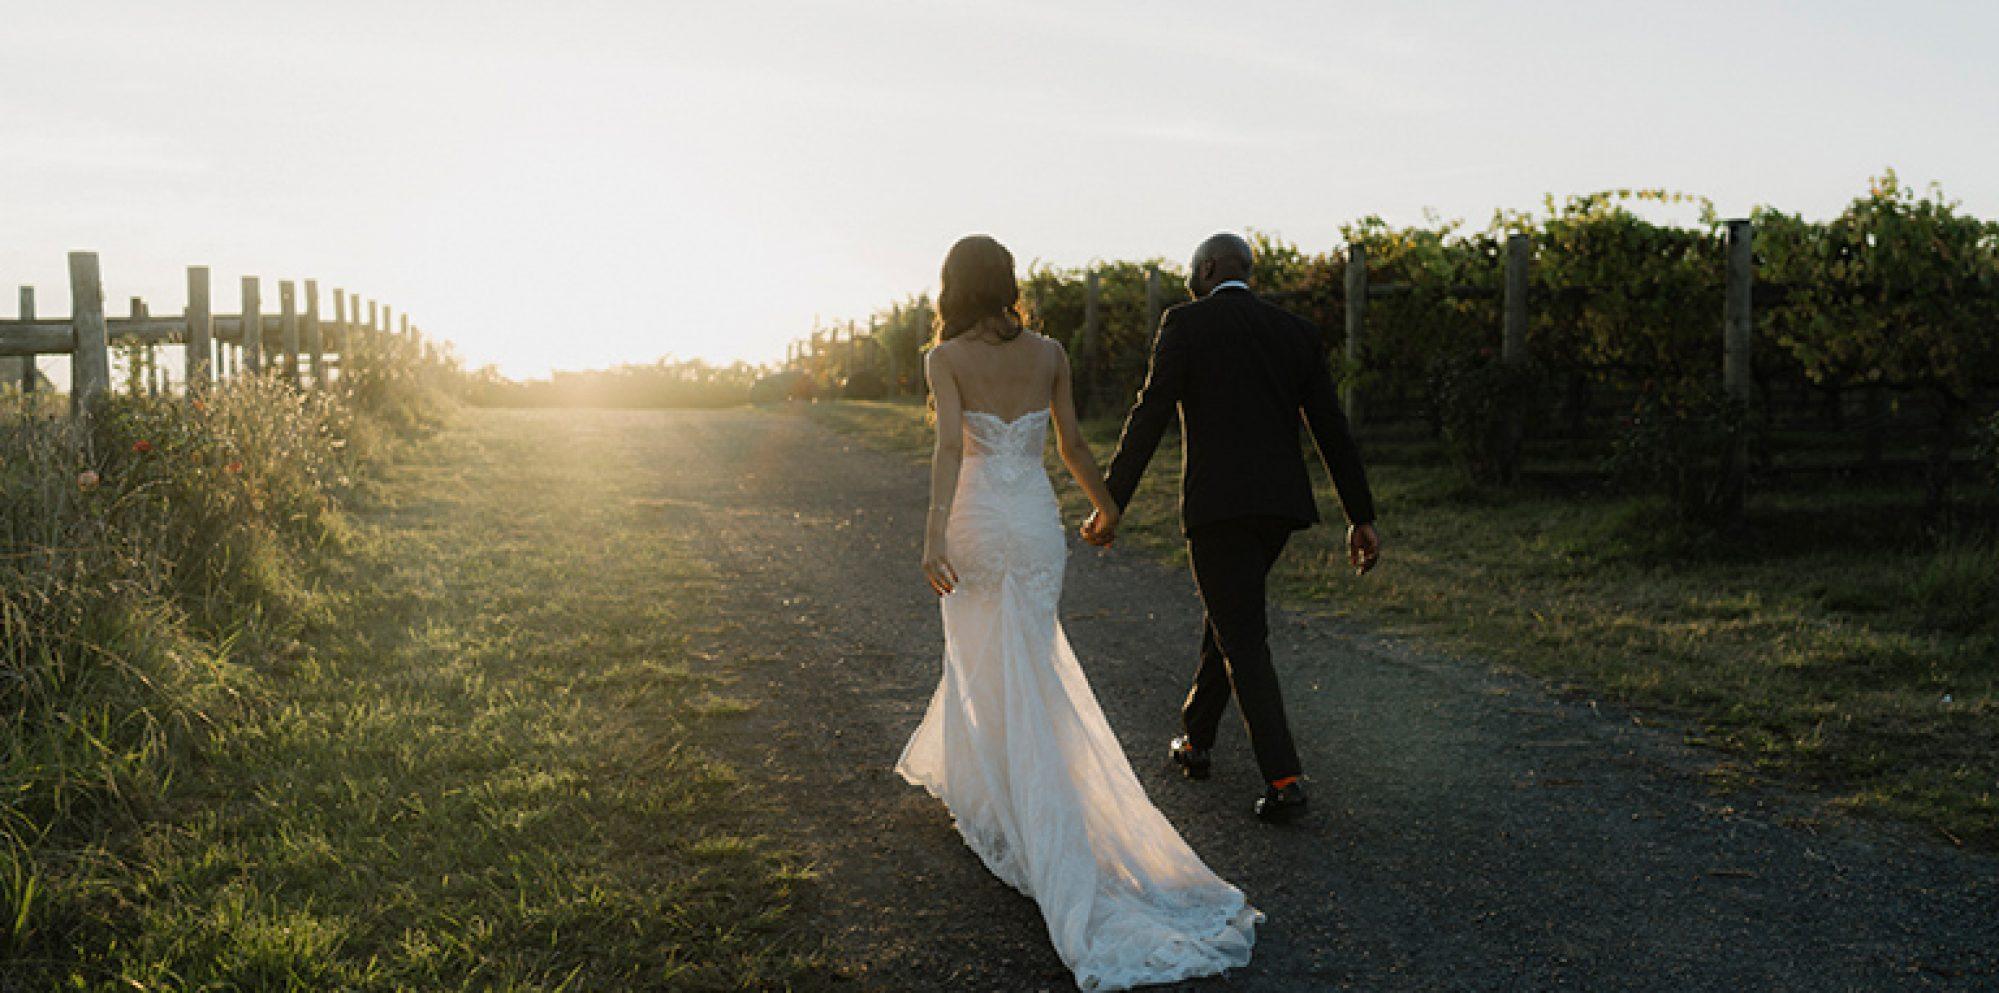 Tushna & warren wedding videography @ vines of the yarra valley